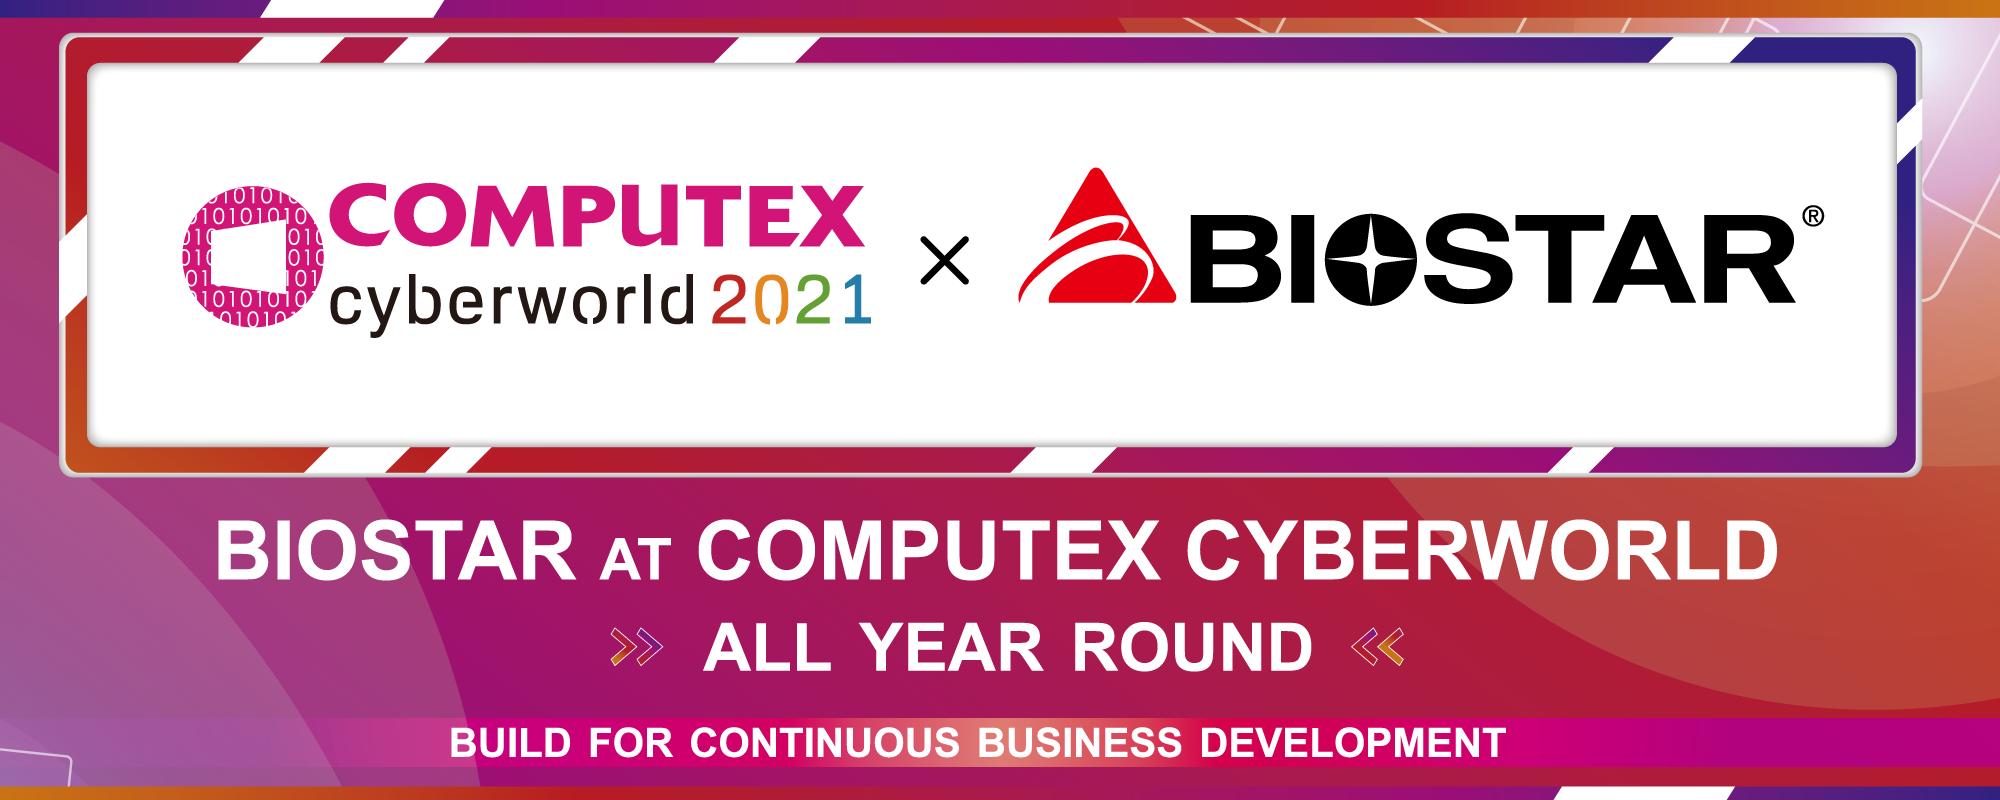 COMPUTEX_cyberworld